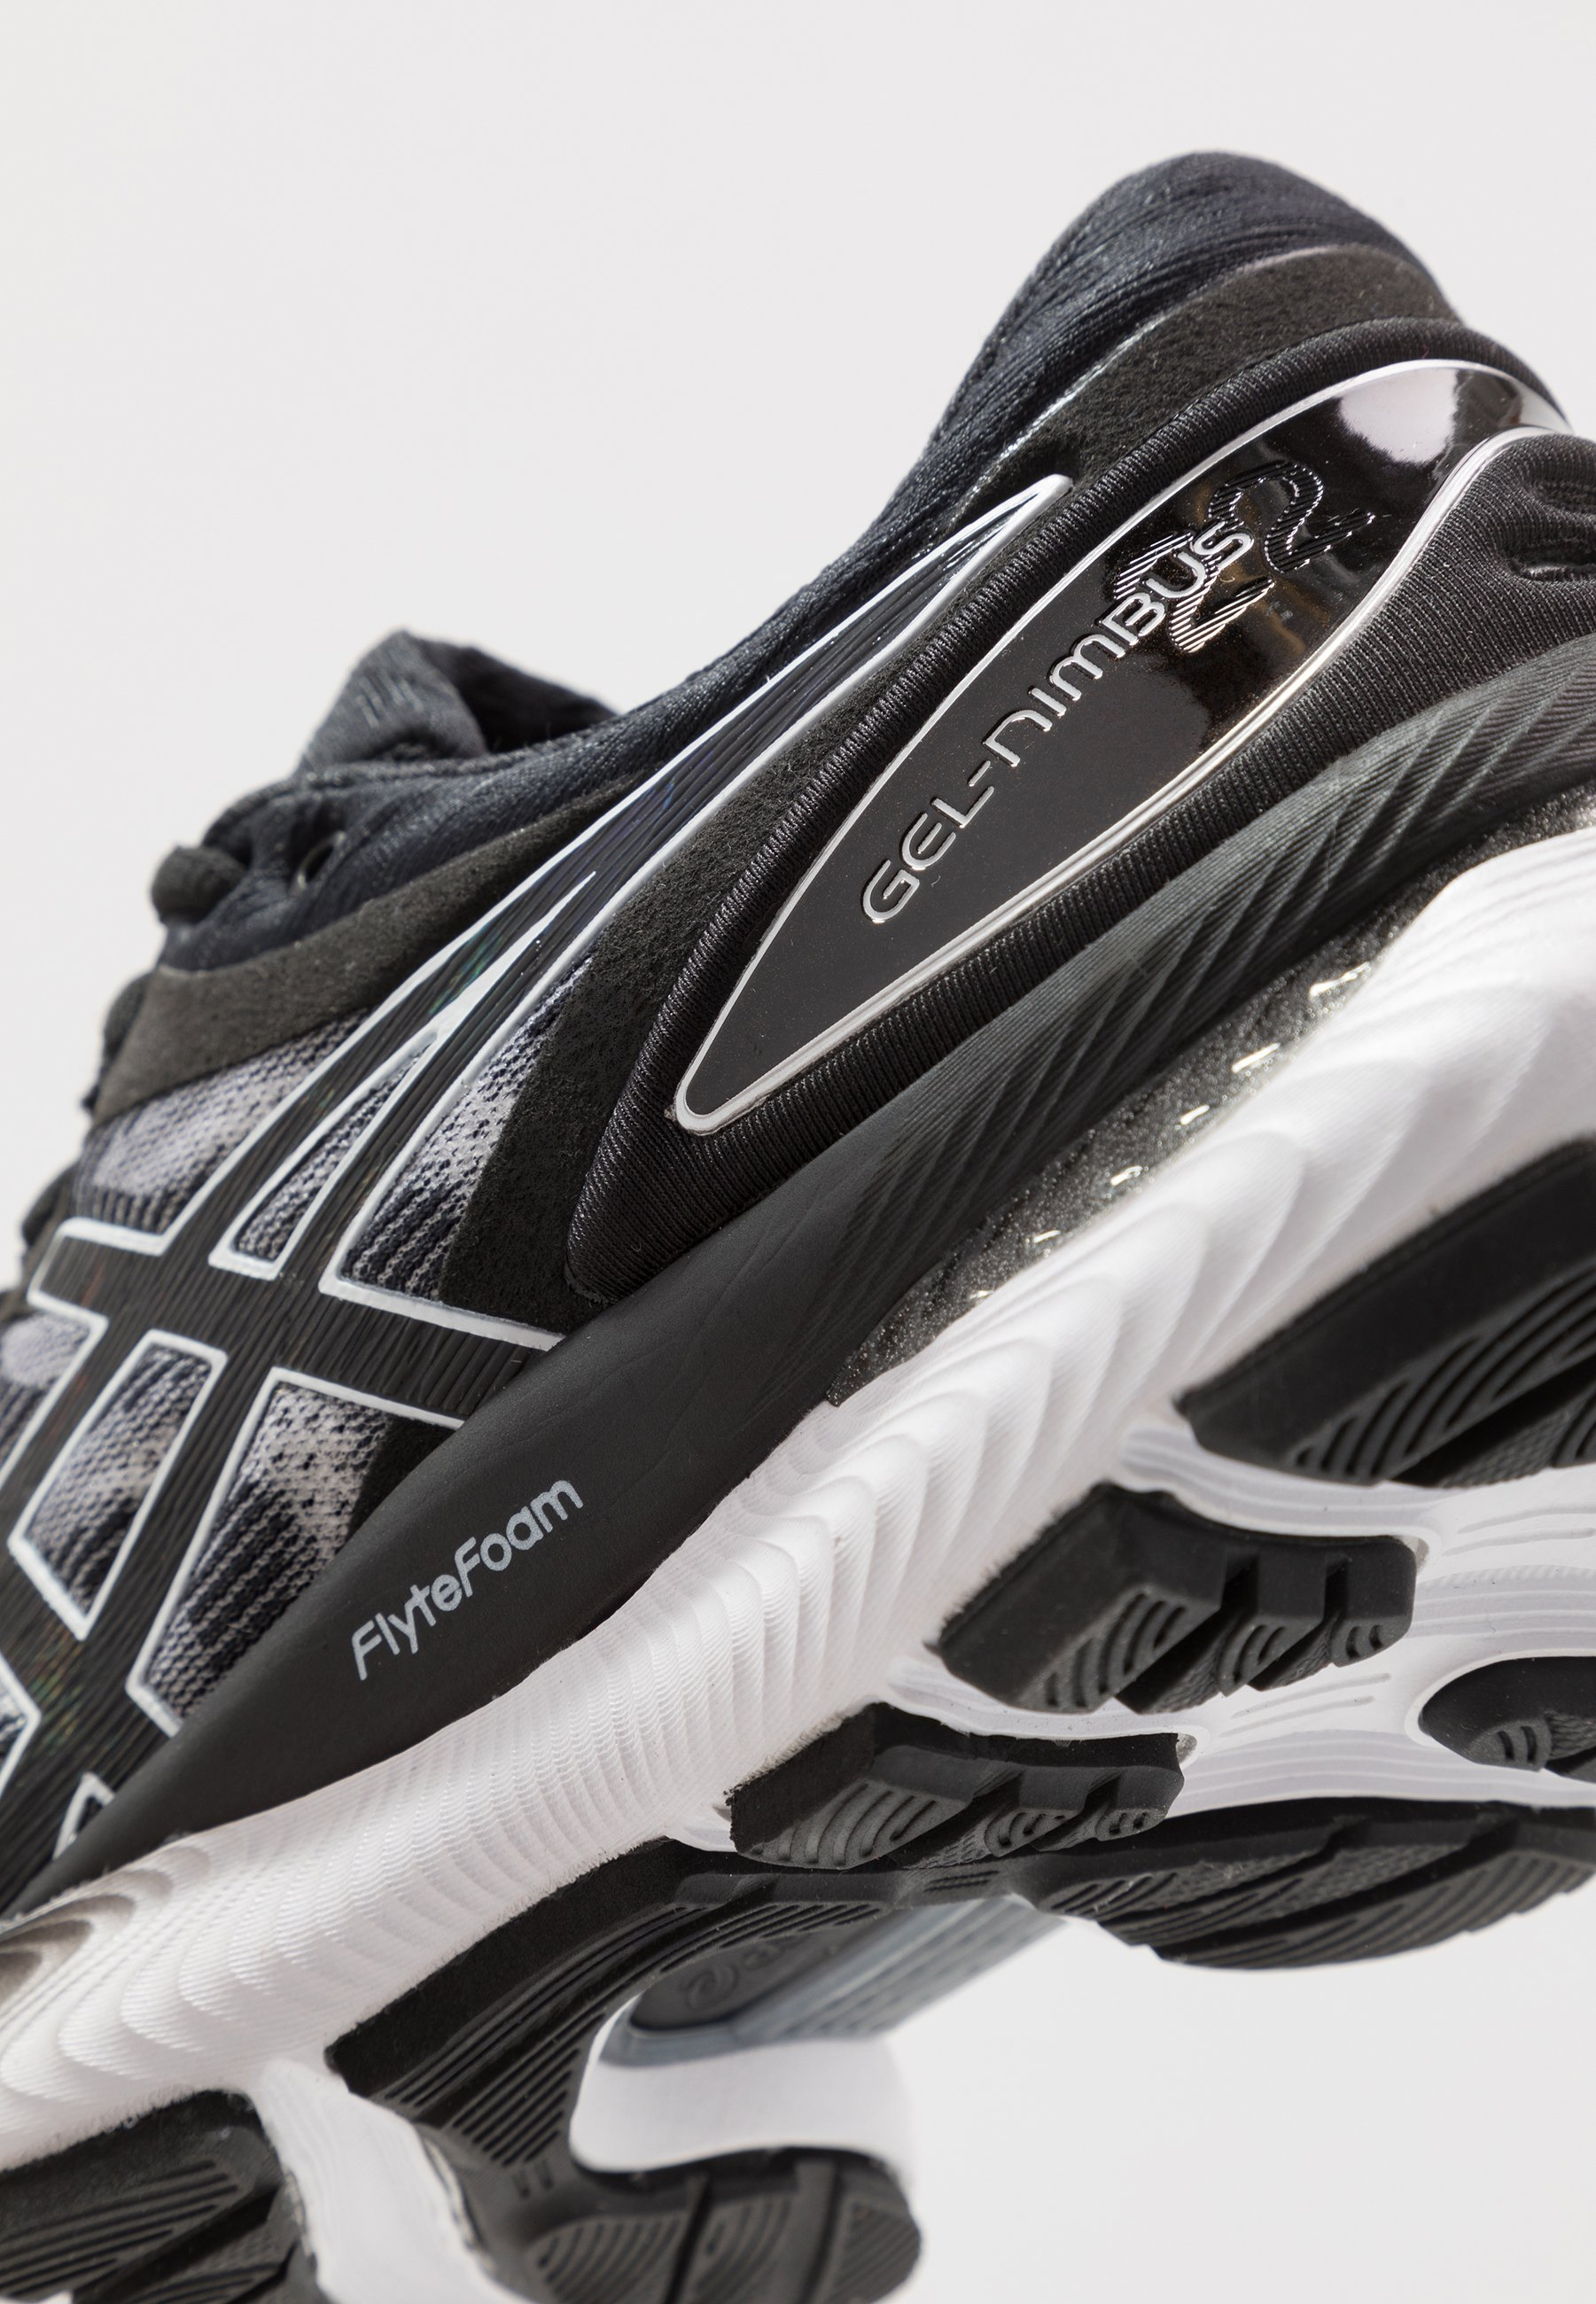 GEL NIMBUS 22 Hardloopschoenen neutraal whiteblack